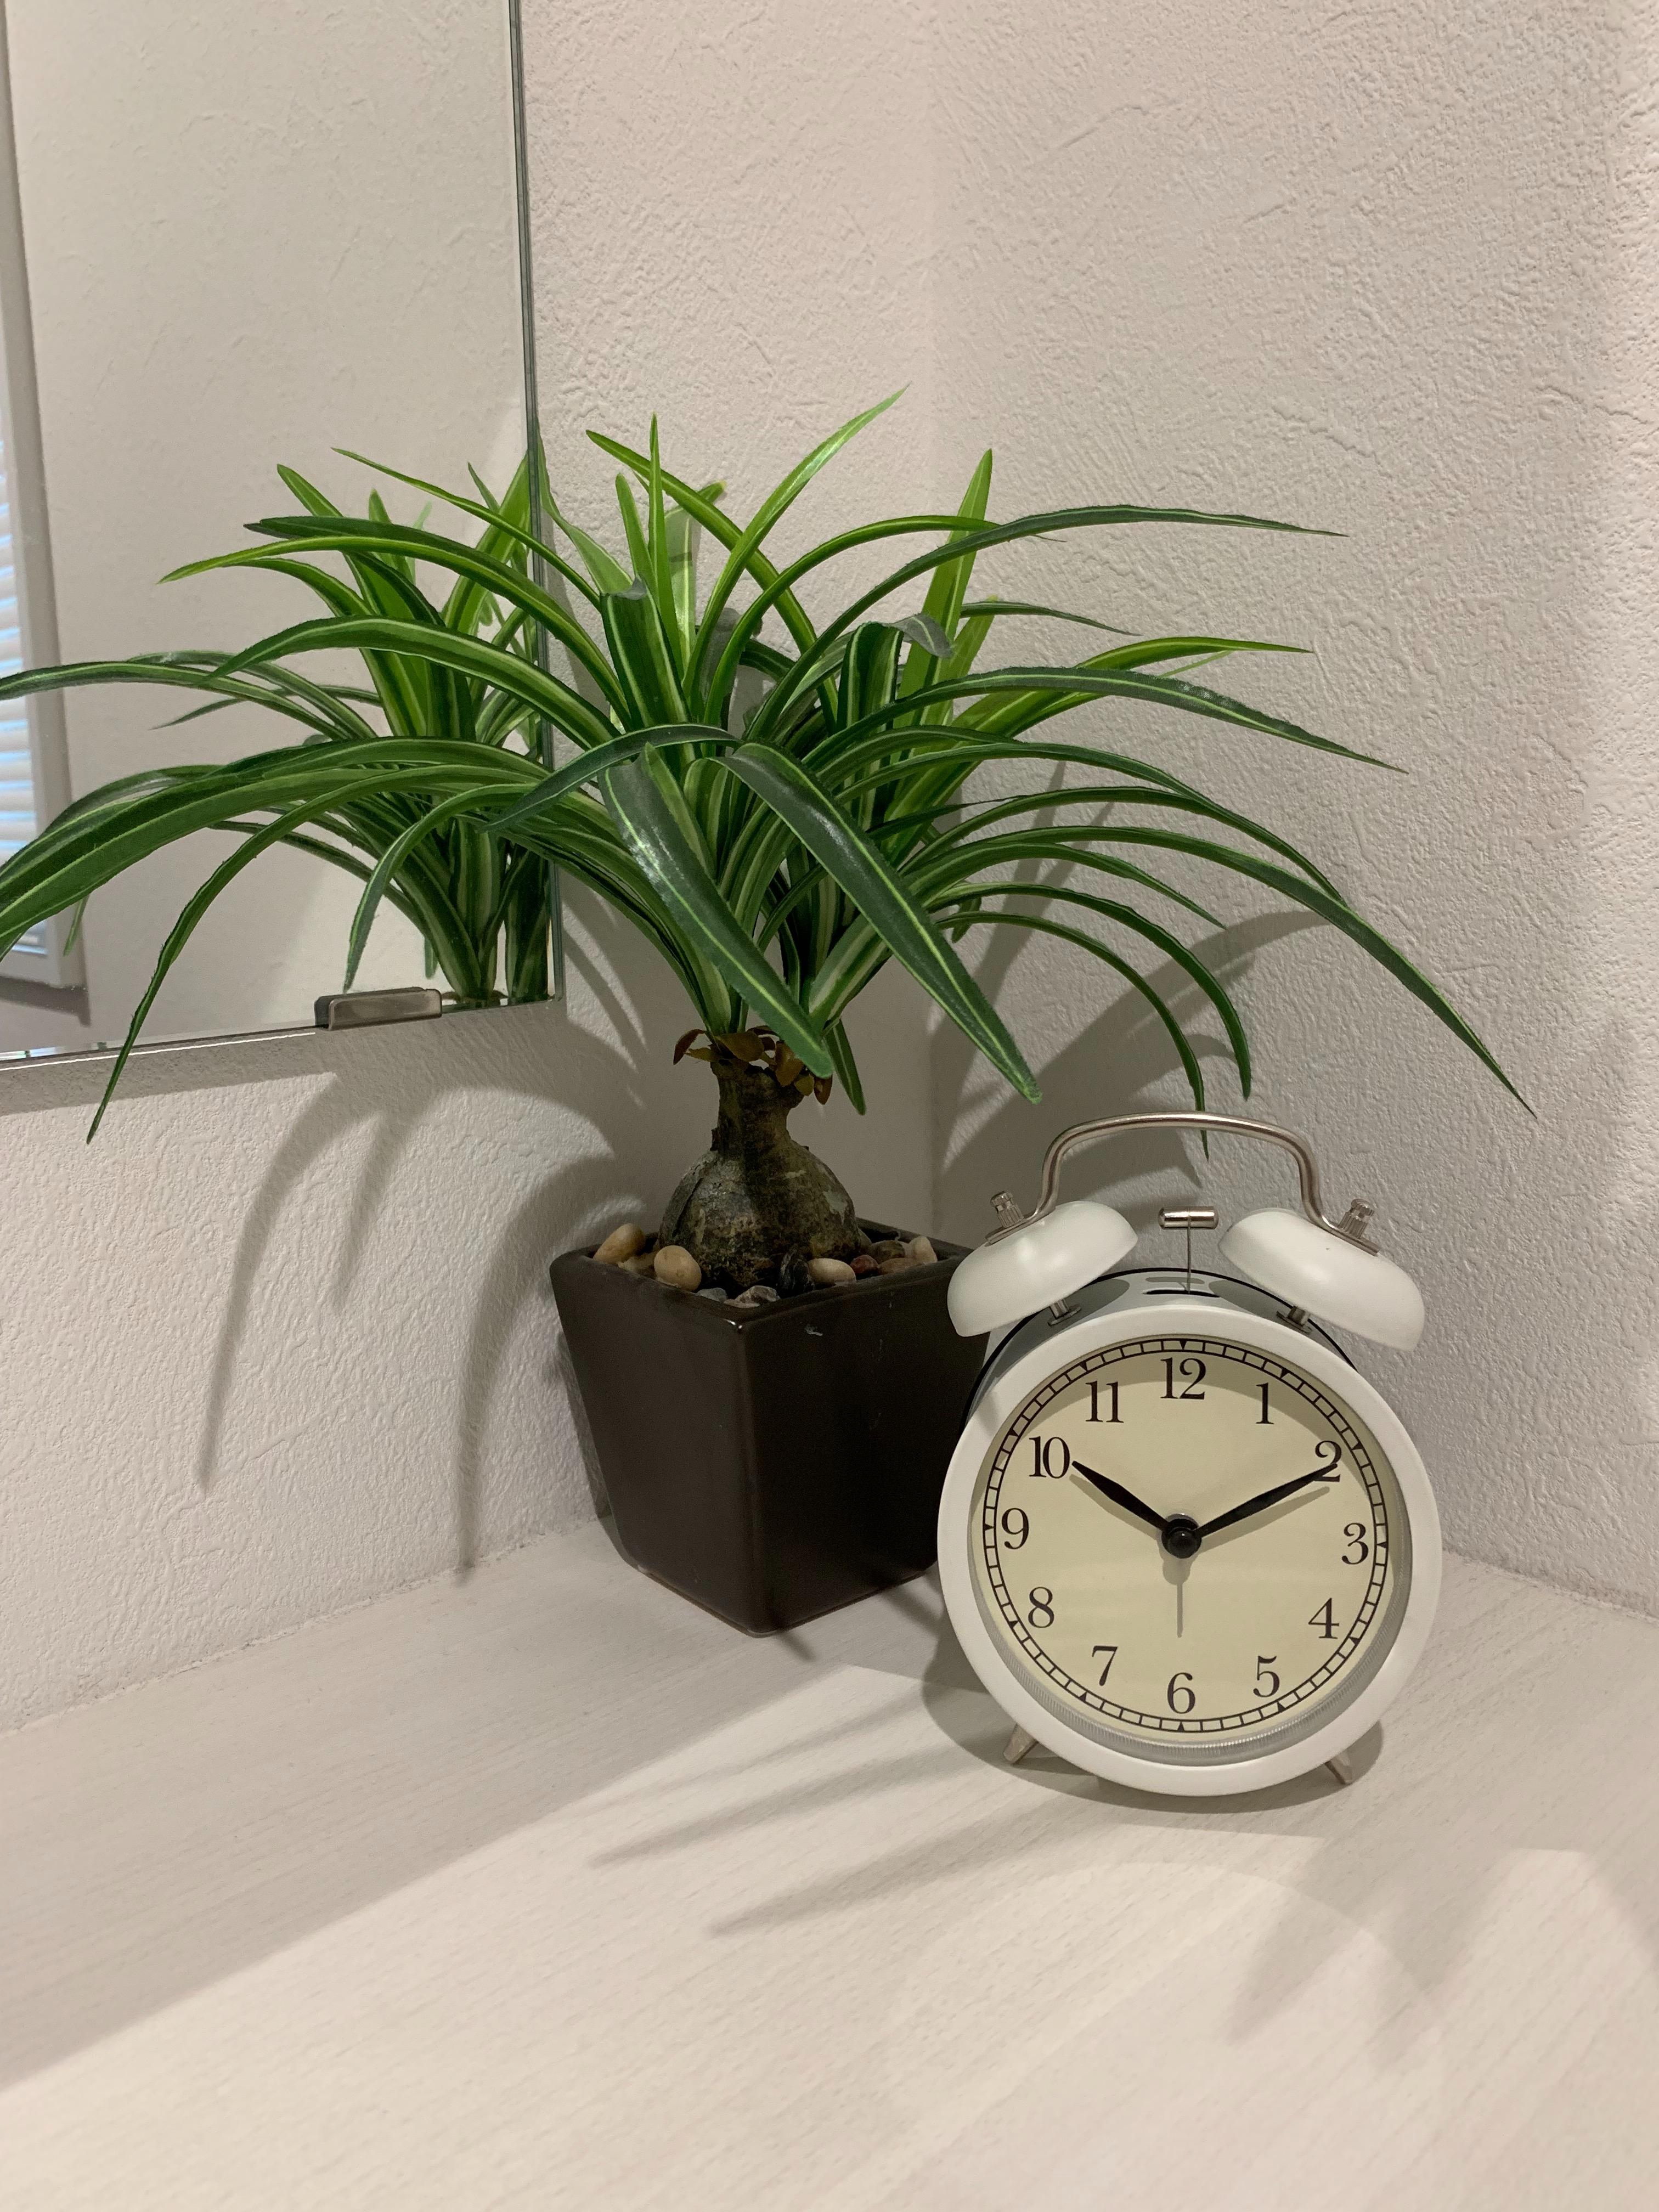 IKEAの置時計 「DEKAD」を洗面室に置いてみた